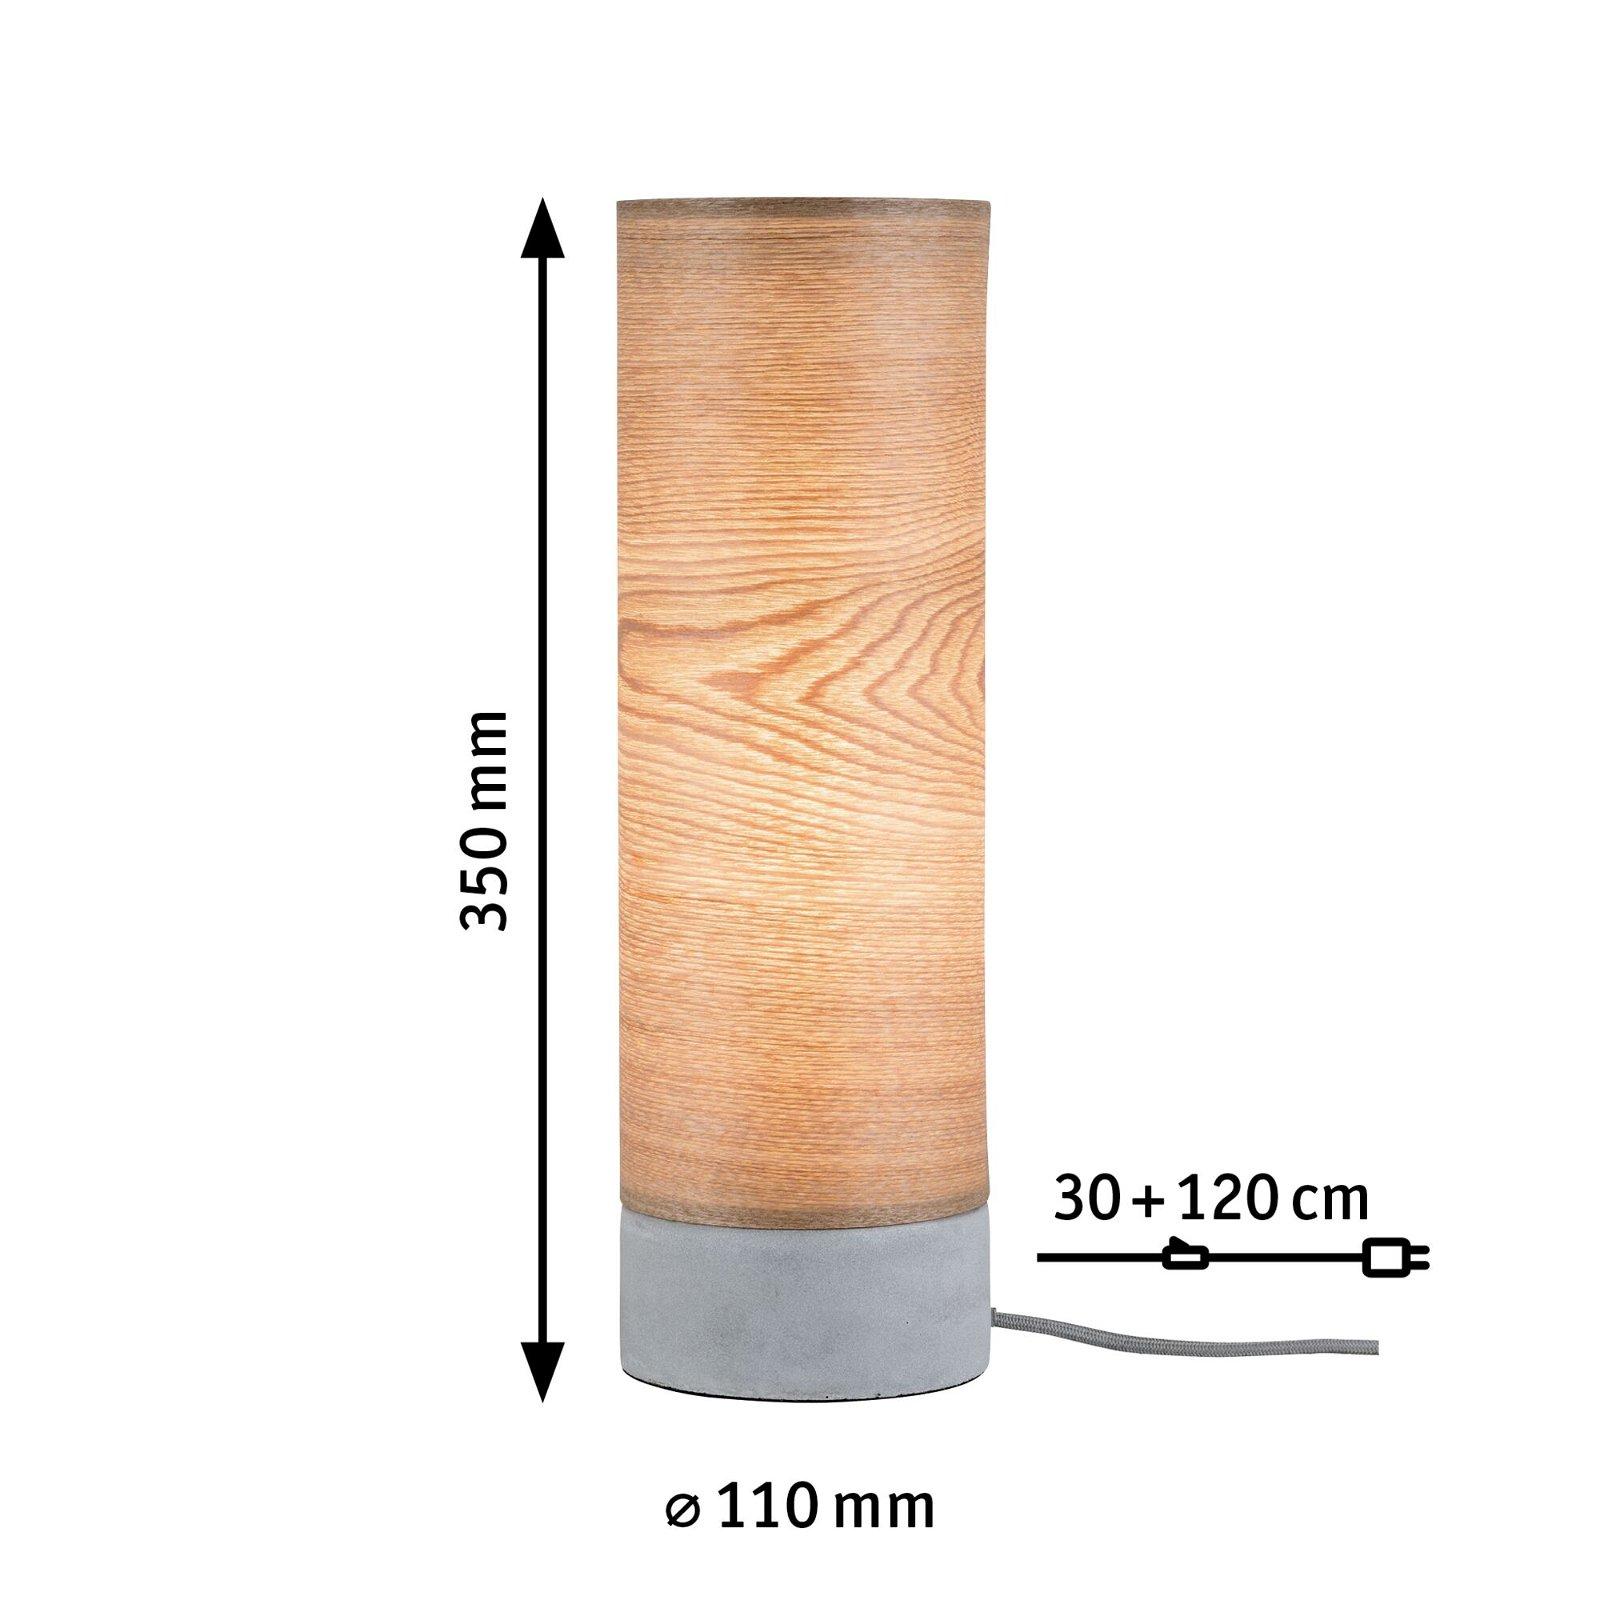 Neordic Tischleuchte Skadi E14 max. 20W Holz/Grau Holz/Beton